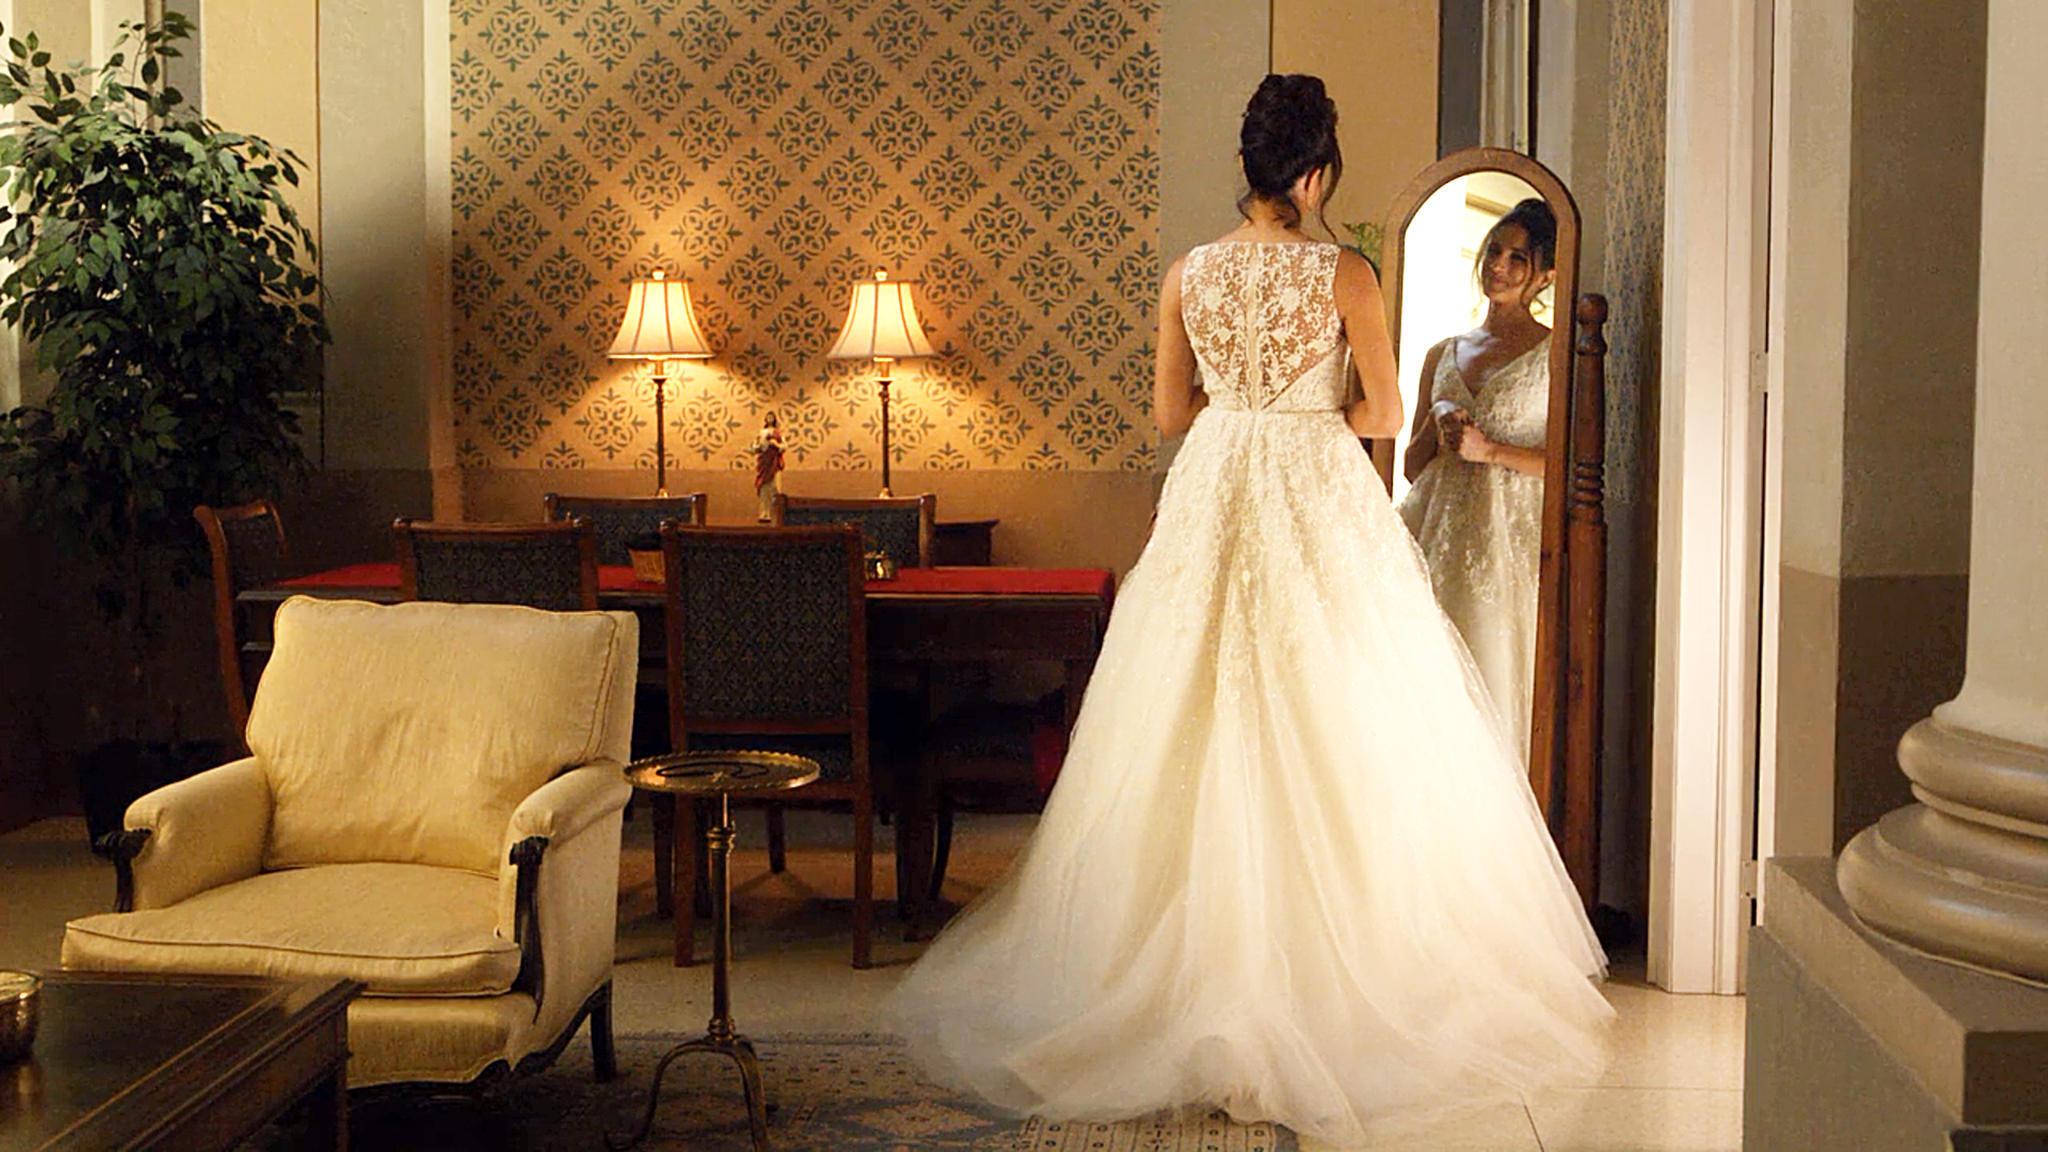 Meghan Markle: So viel soll ihr Brautkleid kosten | GALA.de